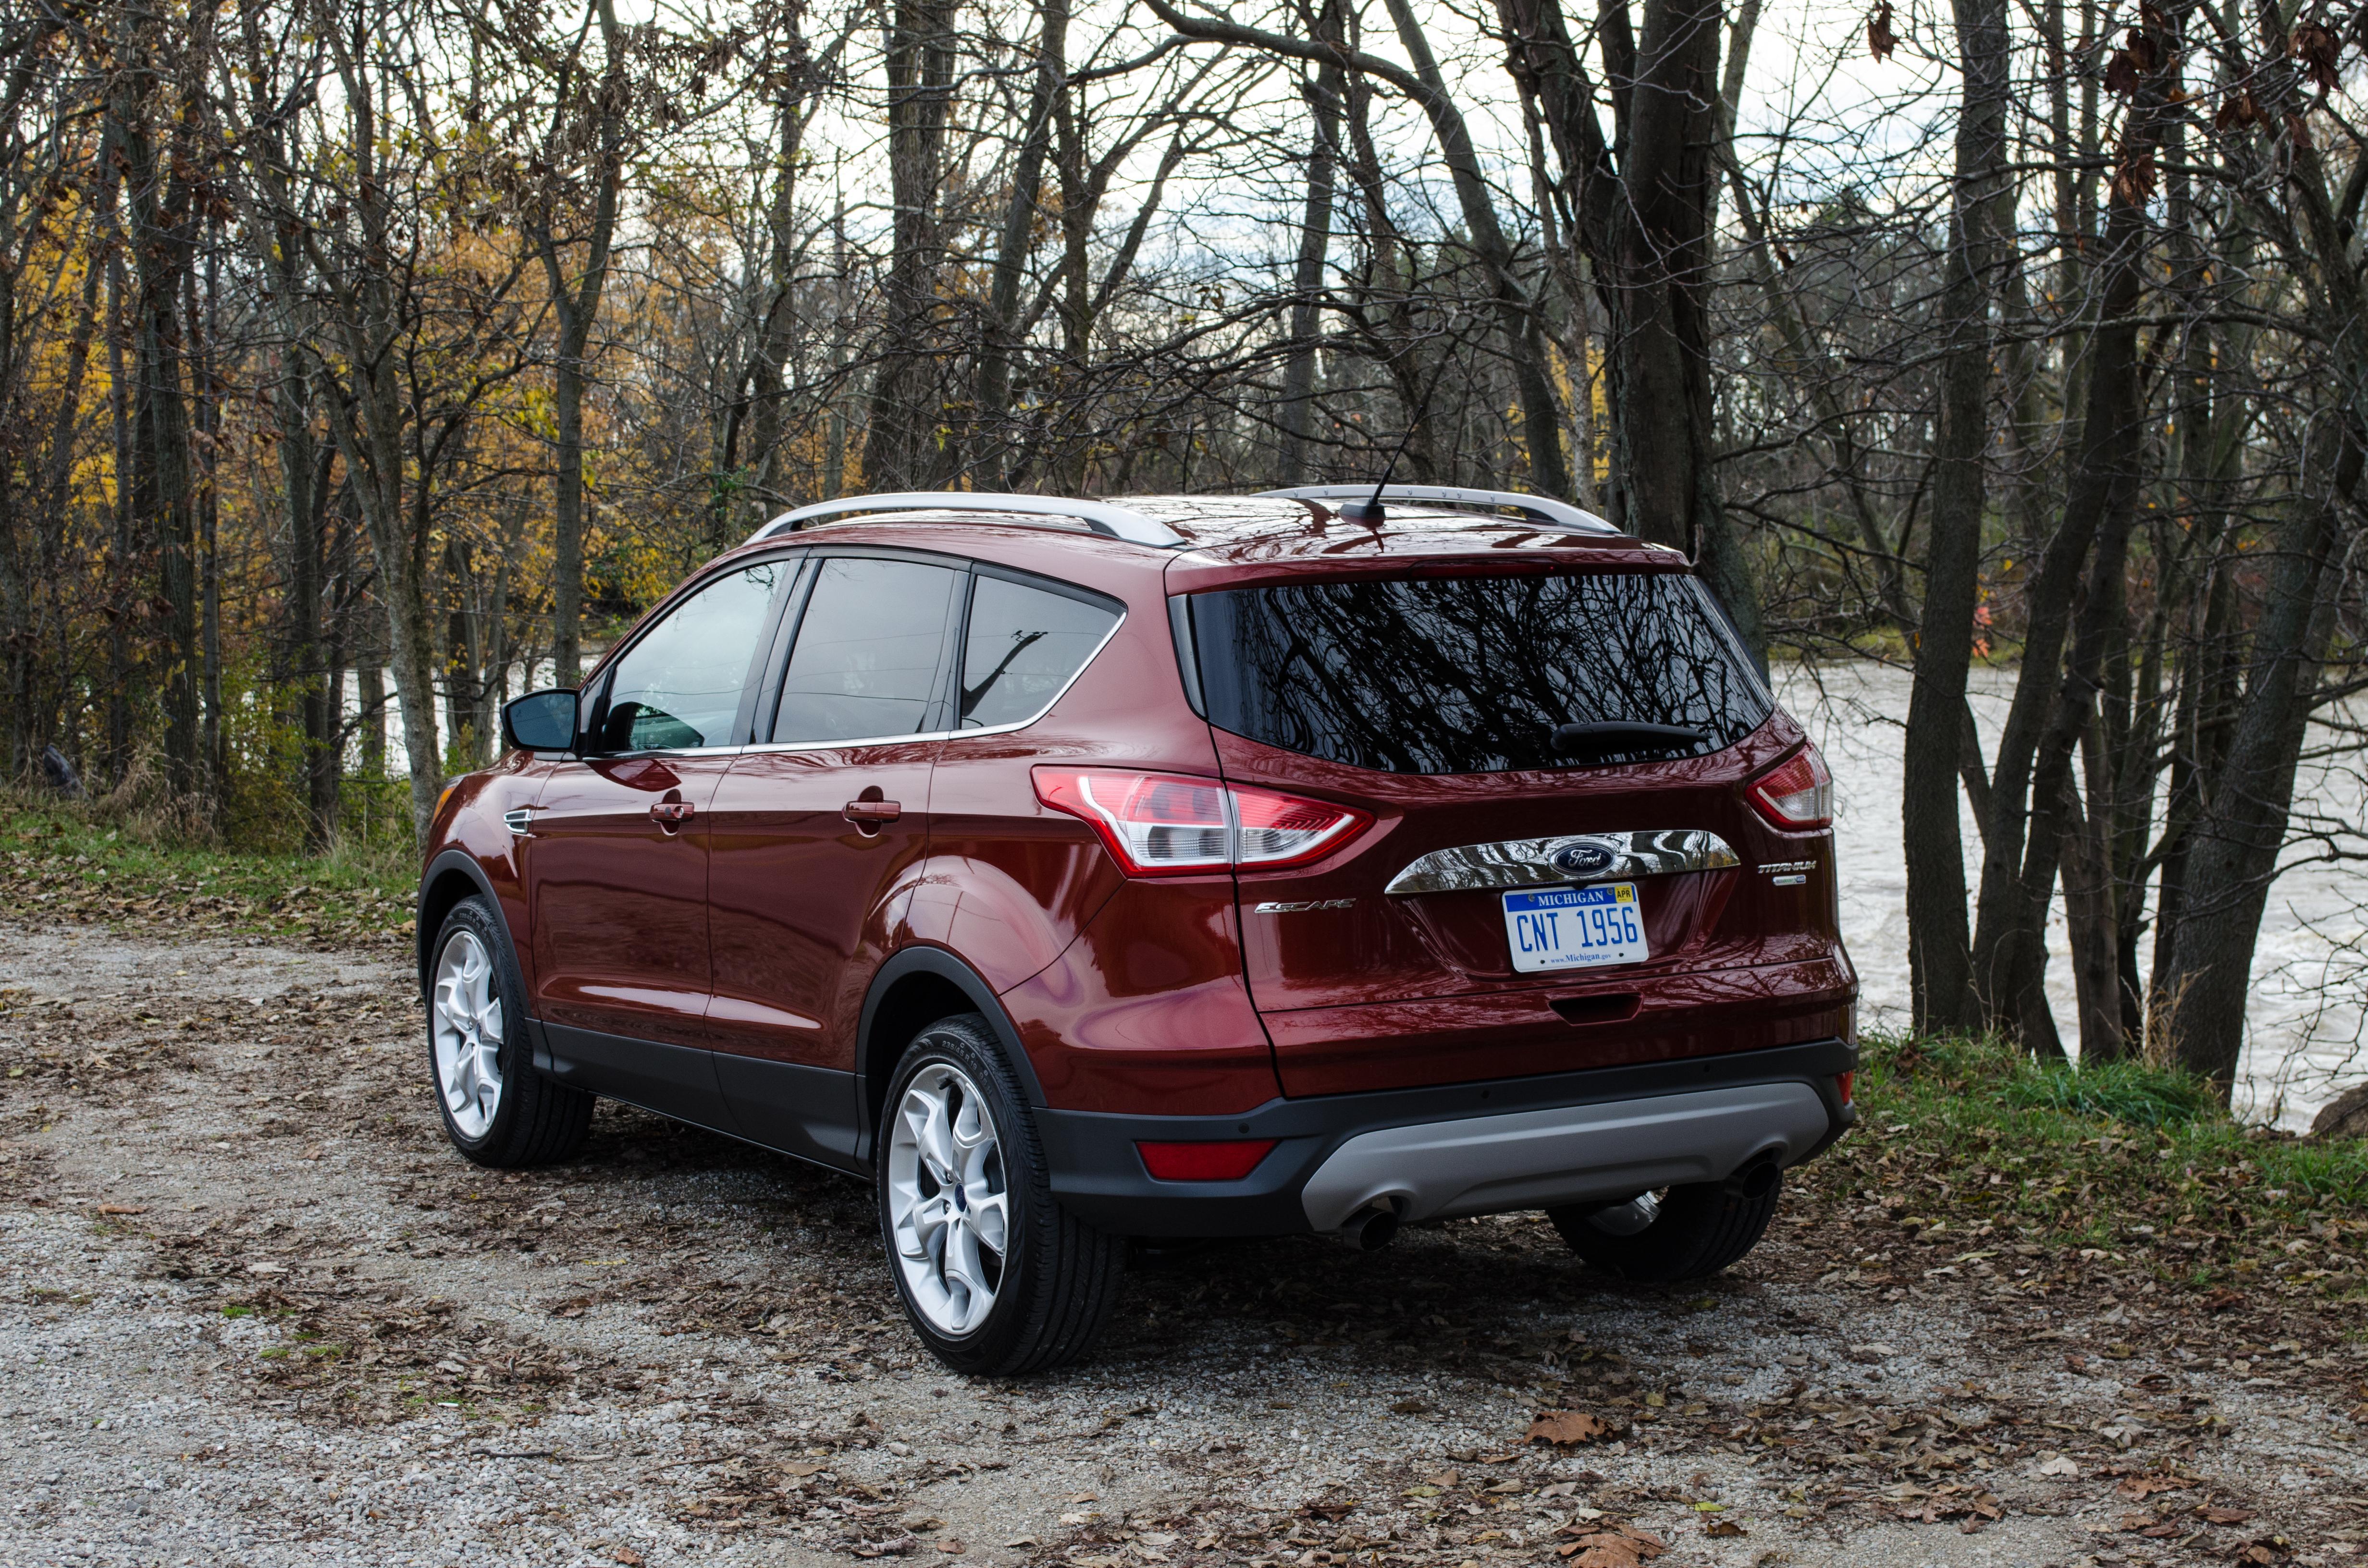 2014 ford escape titanium 21 of 34 motor review. Black Bedroom Furniture Sets. Home Design Ideas